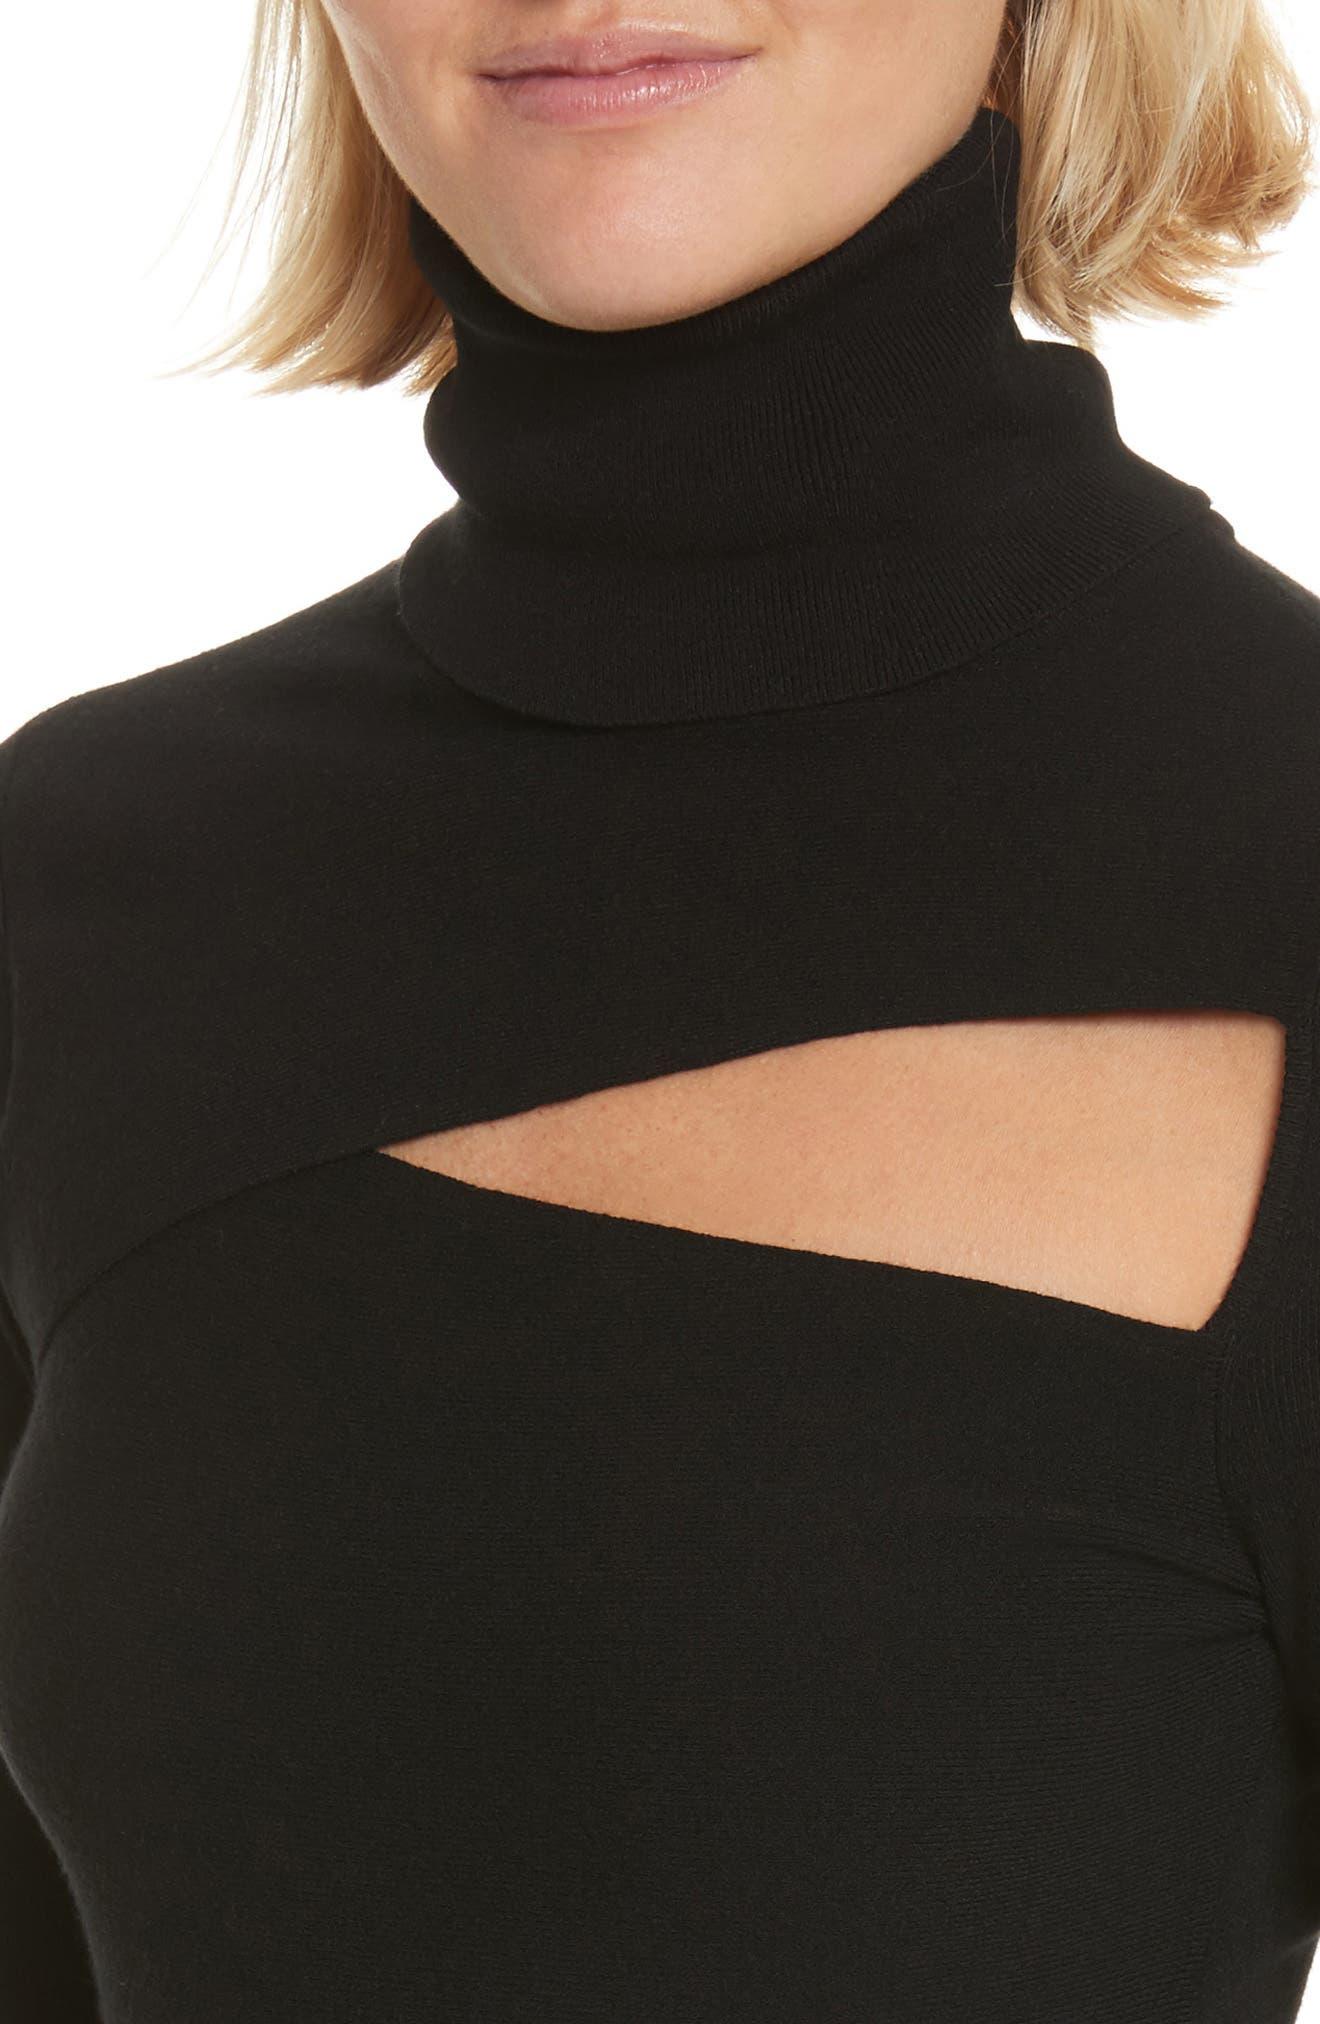 Camden Cutout Turtleneck Sweater,                             Alternate thumbnail 4, color,                             Black